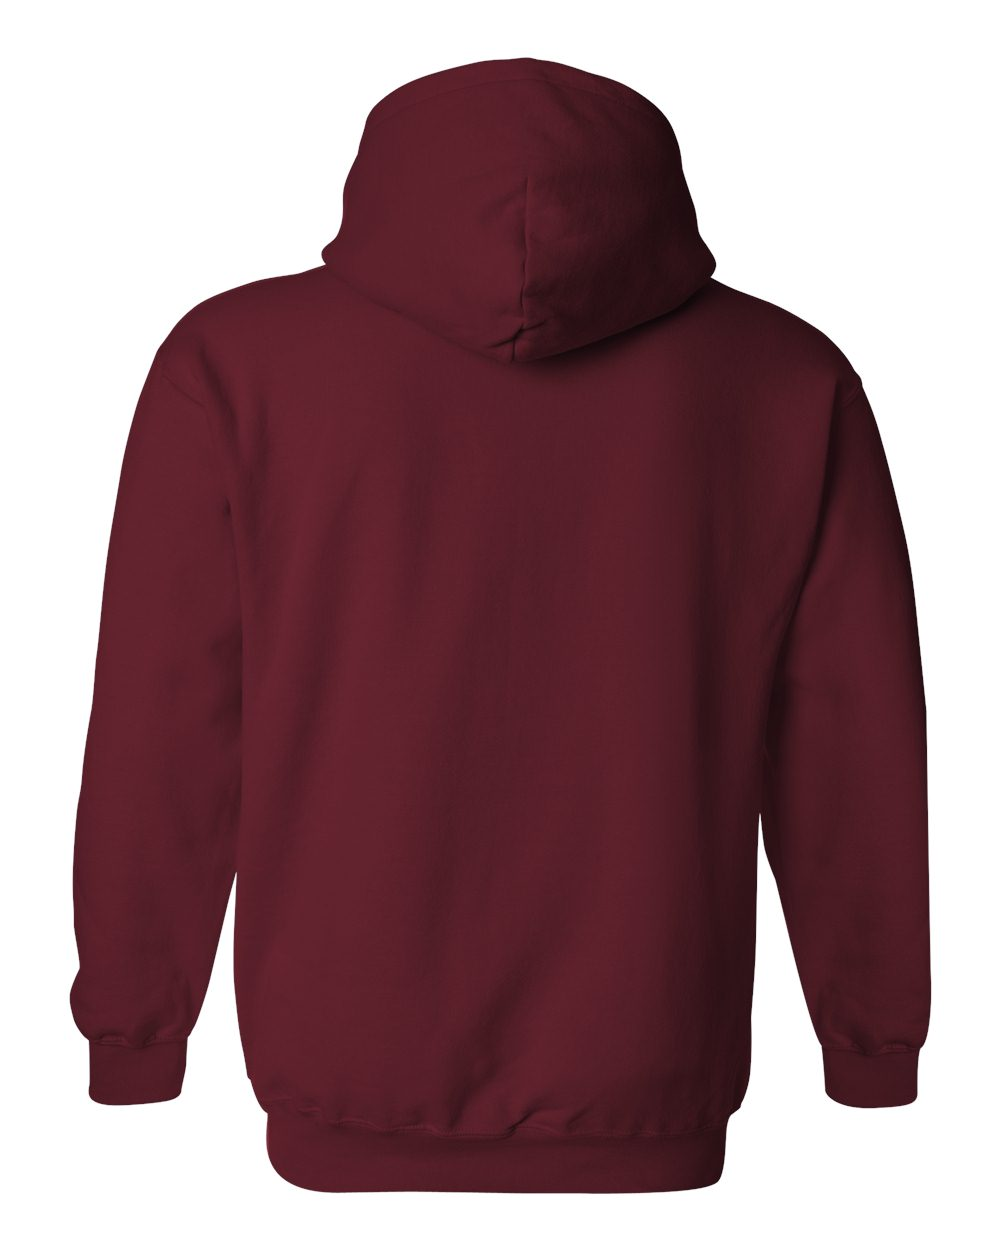 Gildan-Mens-Blank-Hoodie-Heavy-Blend-Hooded-Sweatshirt-Solid-18500-up-to-5XL thumbnail 31